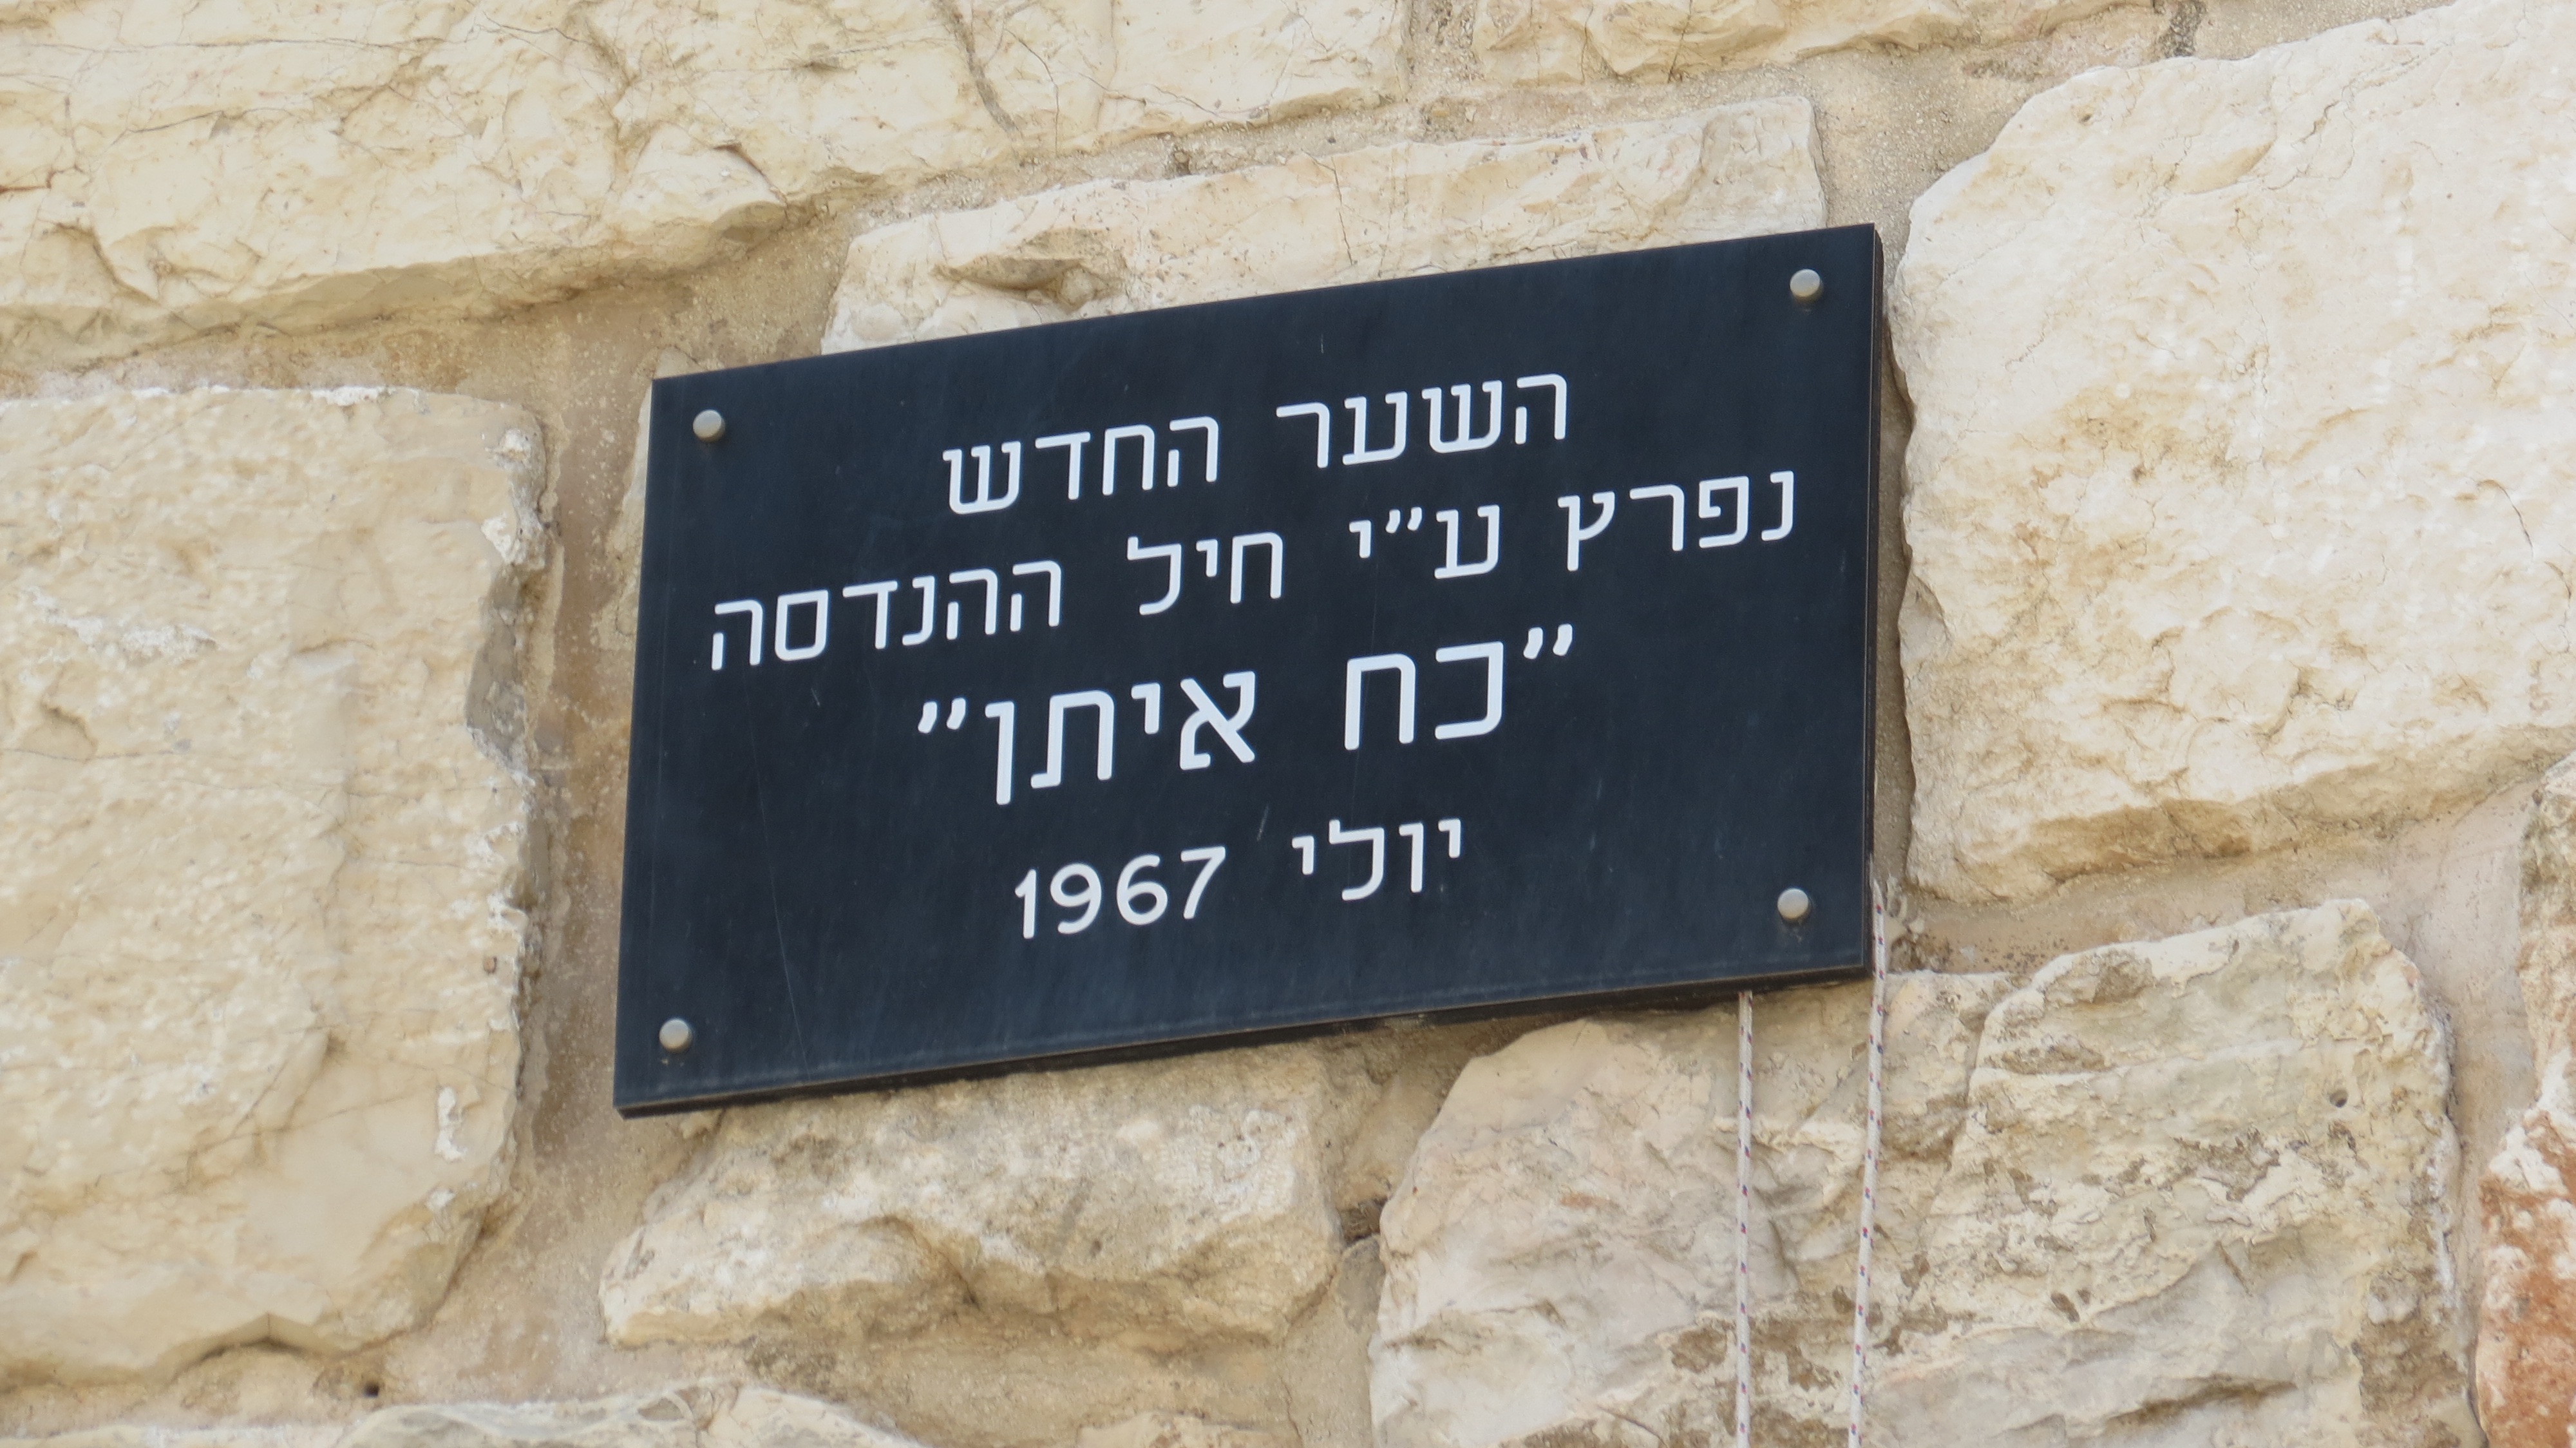 The New Gate - Six Day War Memorial